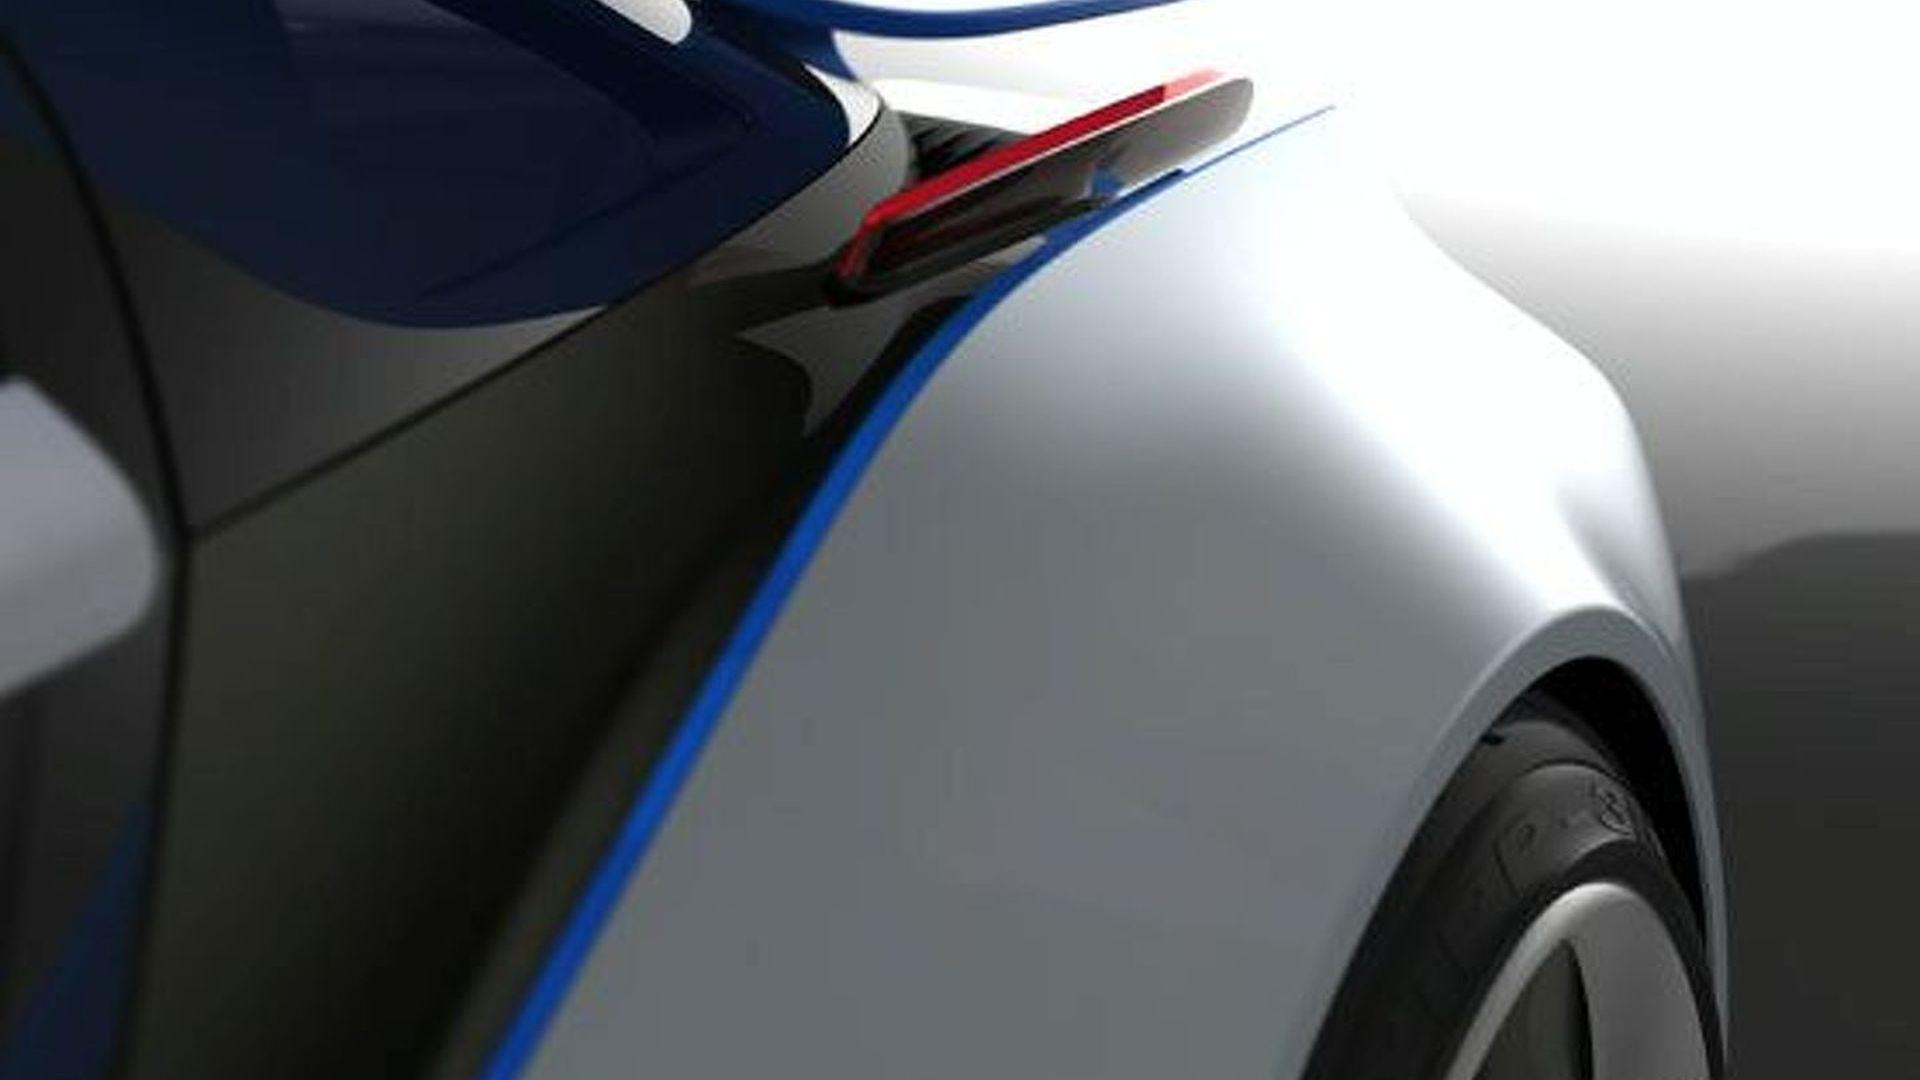 BMW Vision EfficientDynamics Concept Teaser No. 2 Released